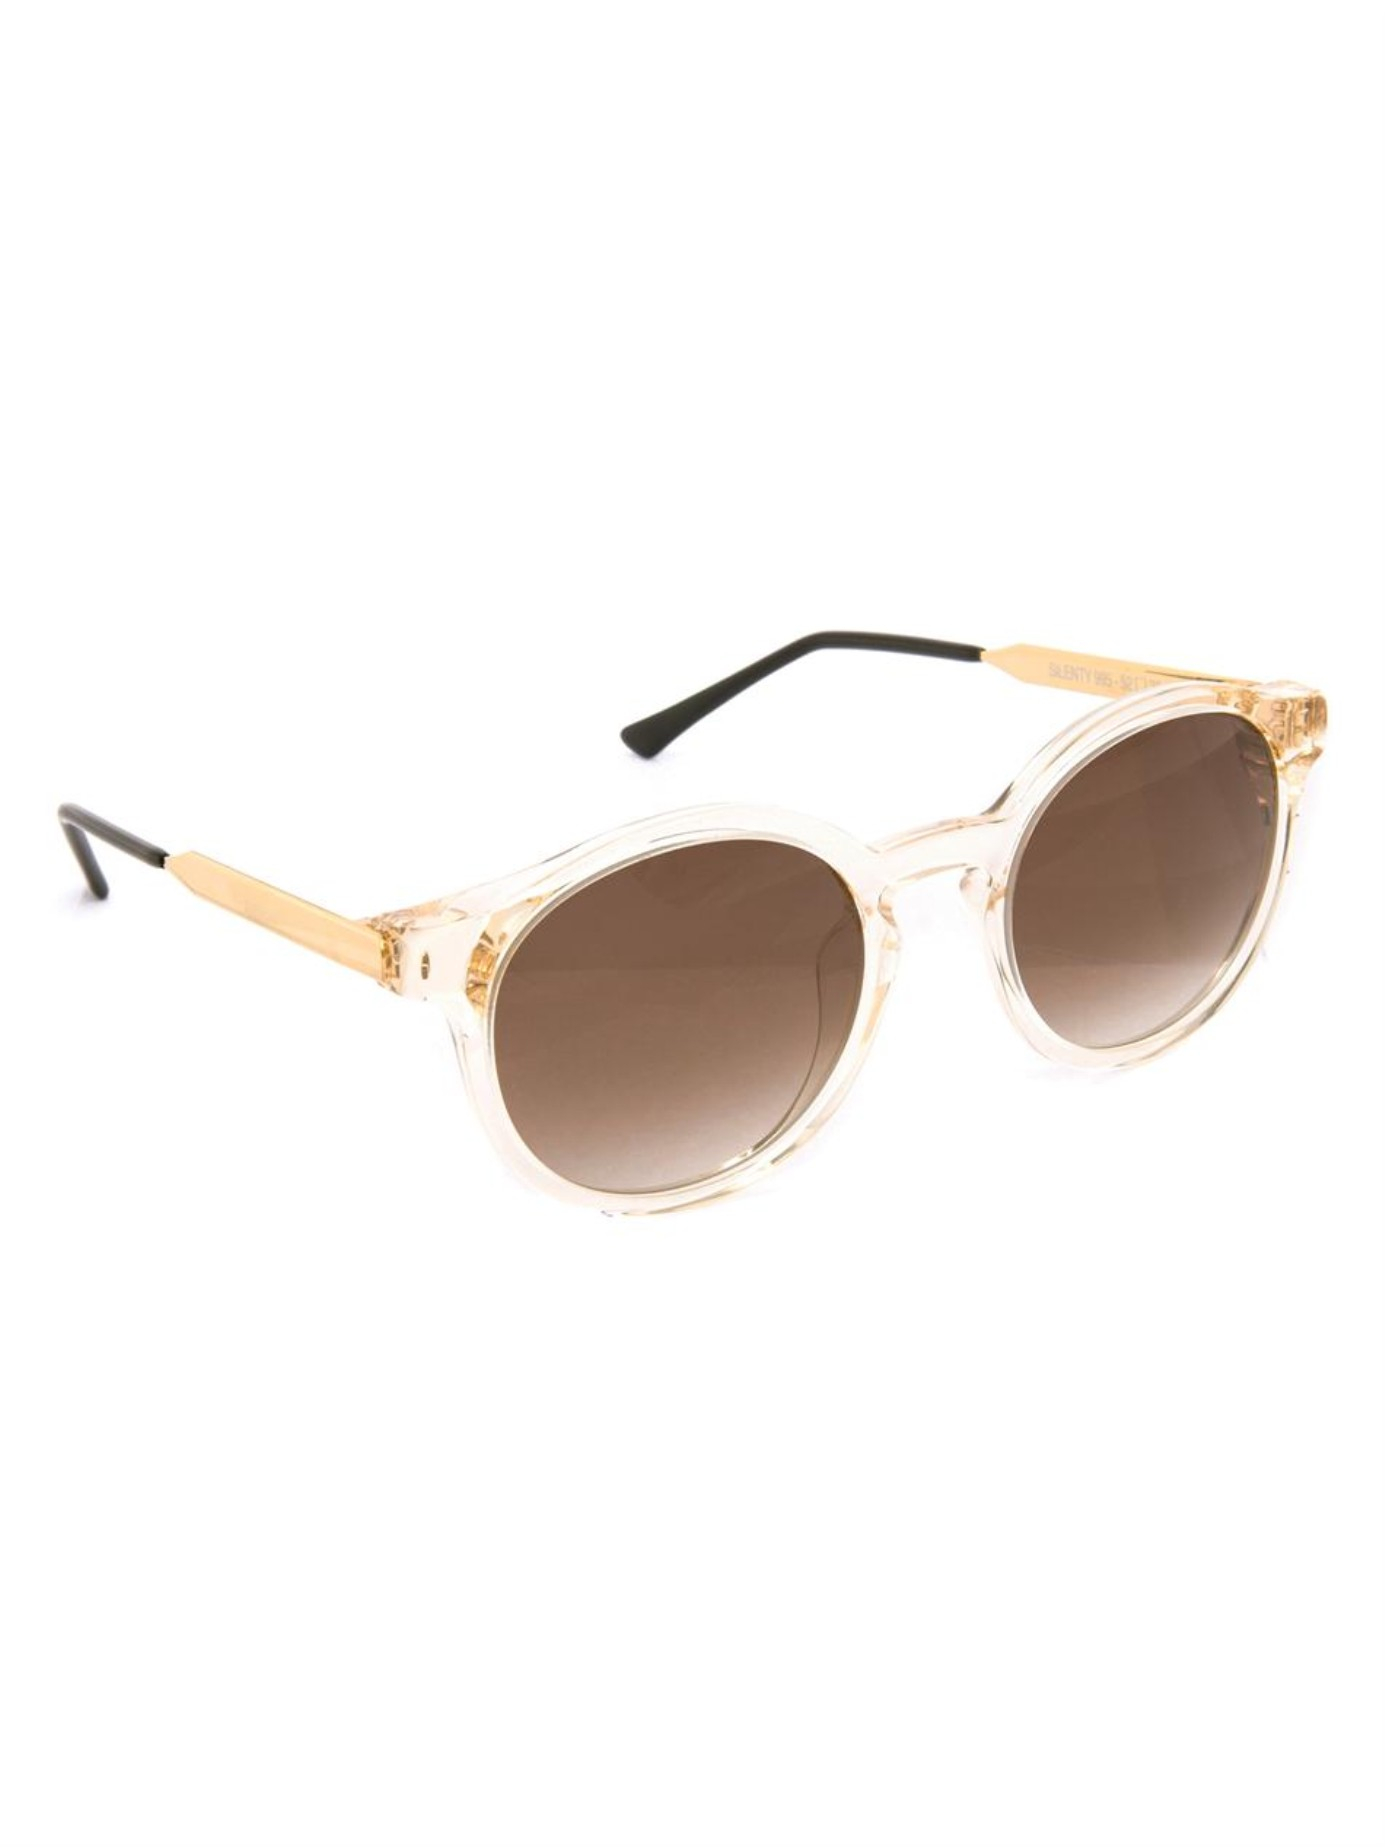 THIERRY LASRY Silenty round sunglasses Hors8s9lgB